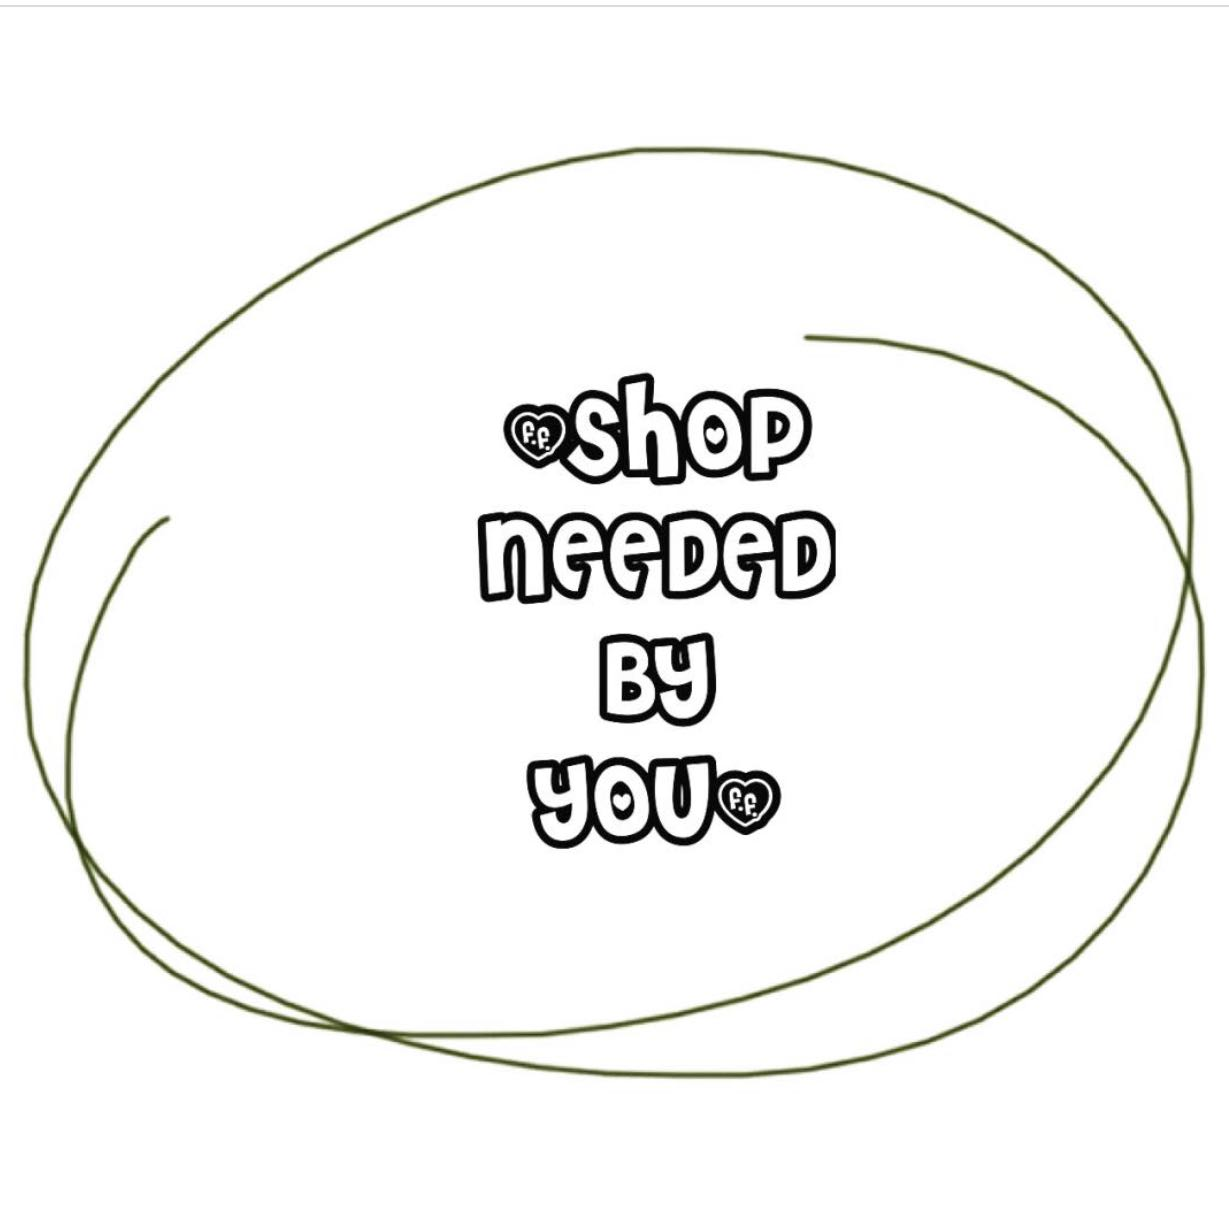 shopneededbyyou